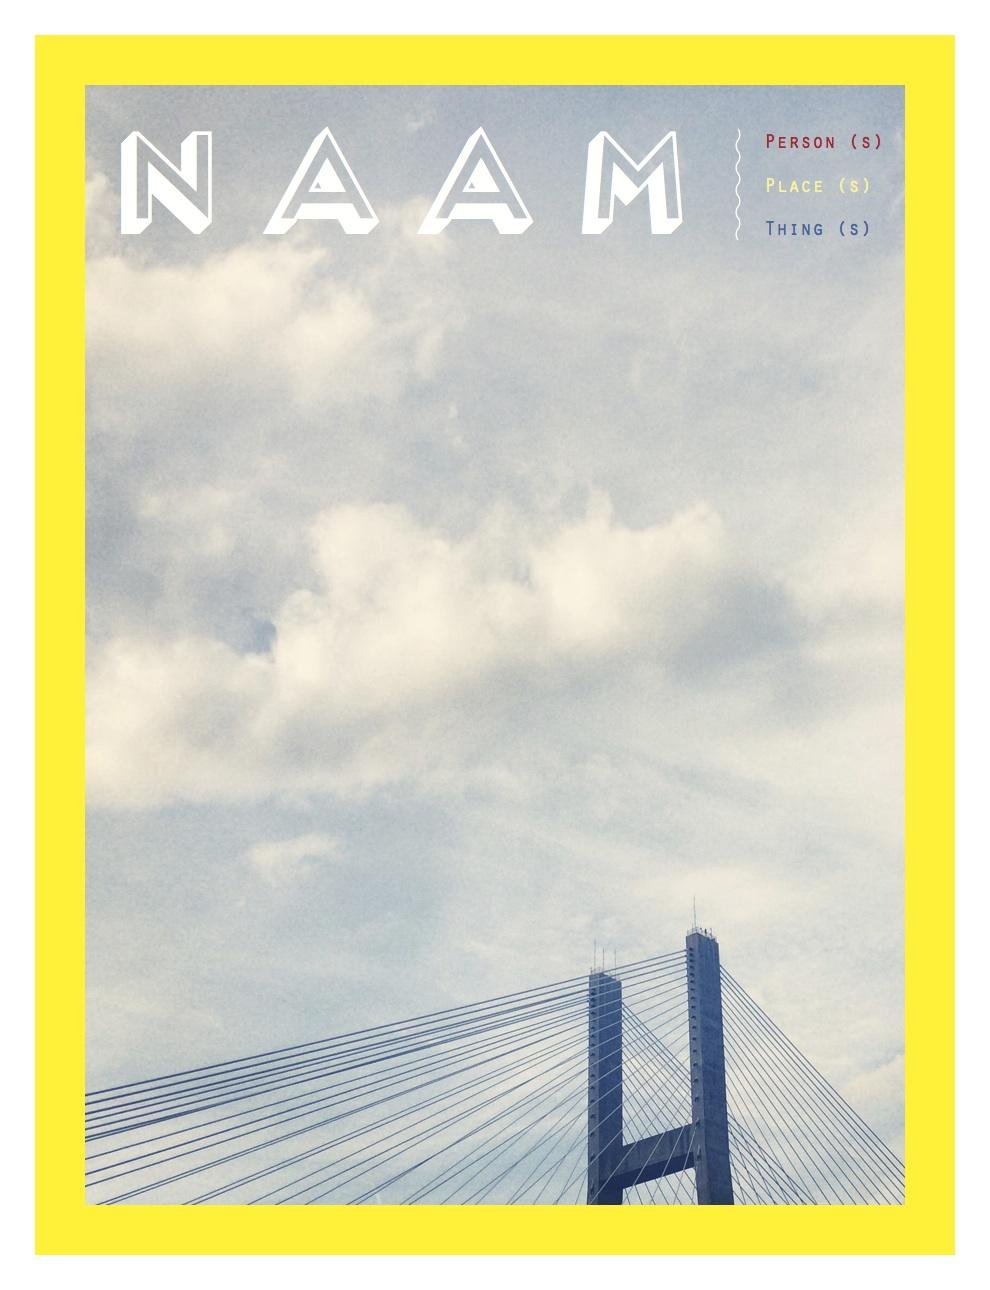 Cover of NAAM Magazine. Photo by Perri Rothenberg in Savannah, GA.